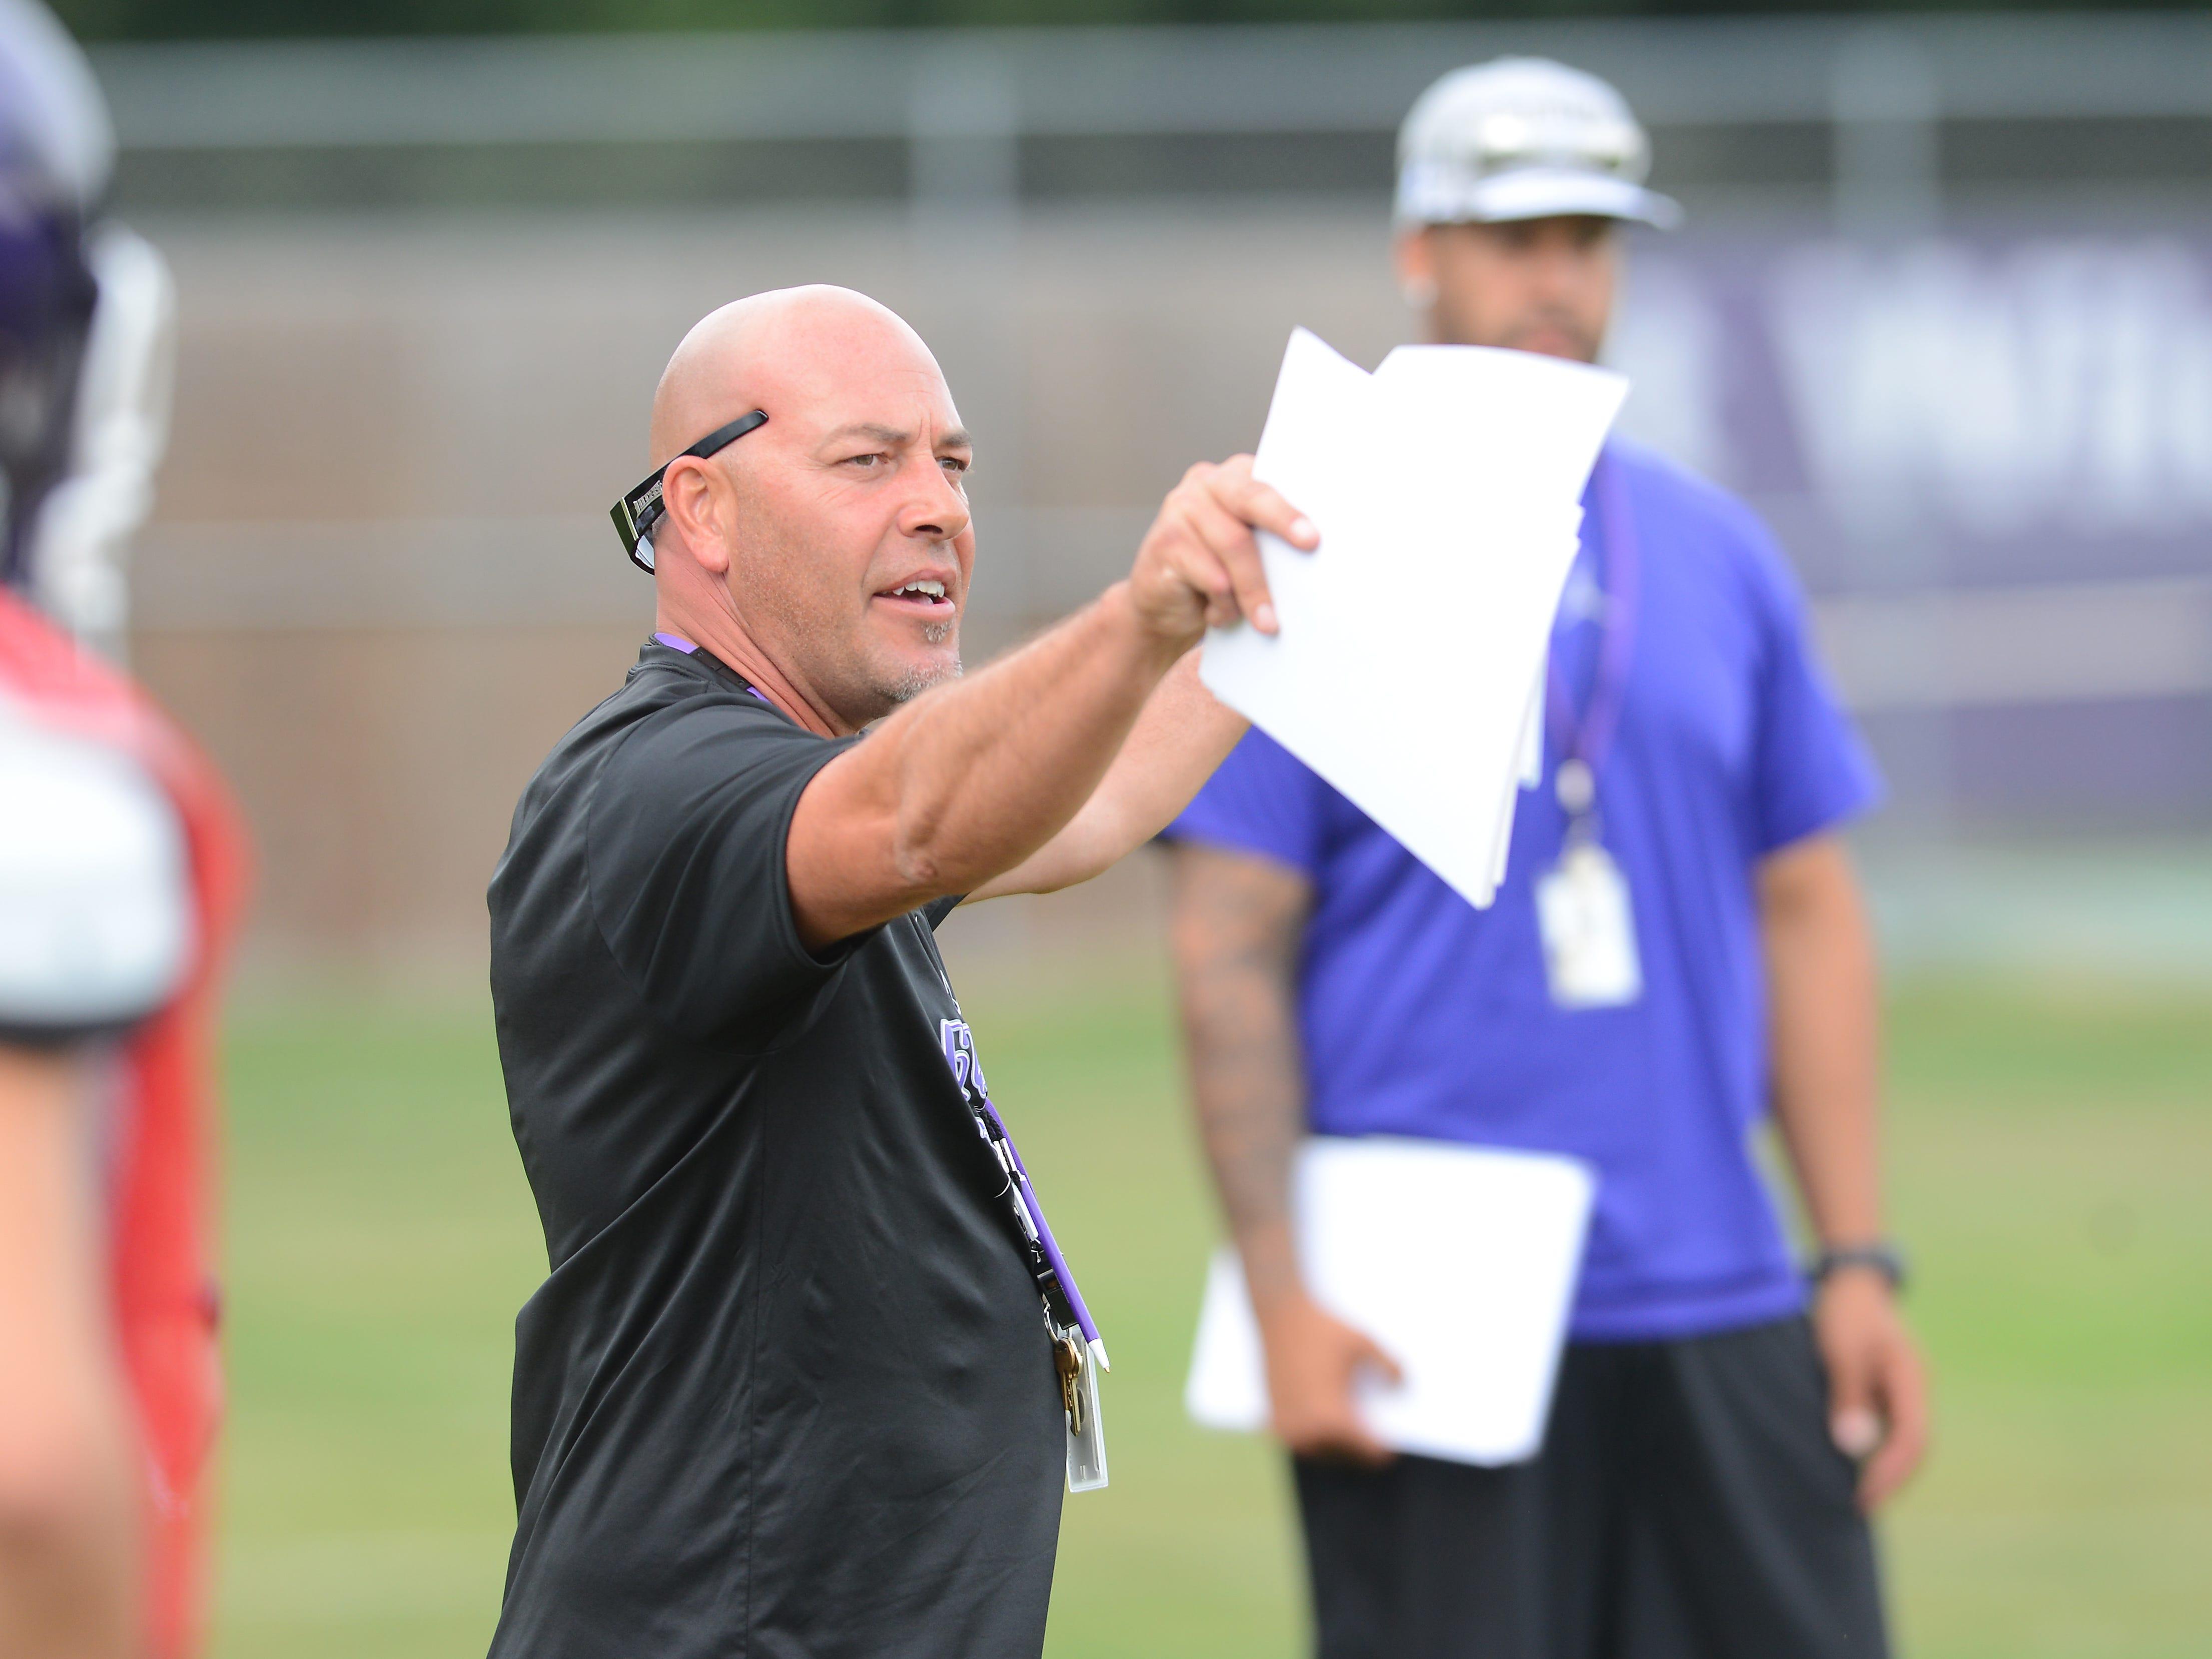 Green Bay West High School head football coach Jeff Behrendt.